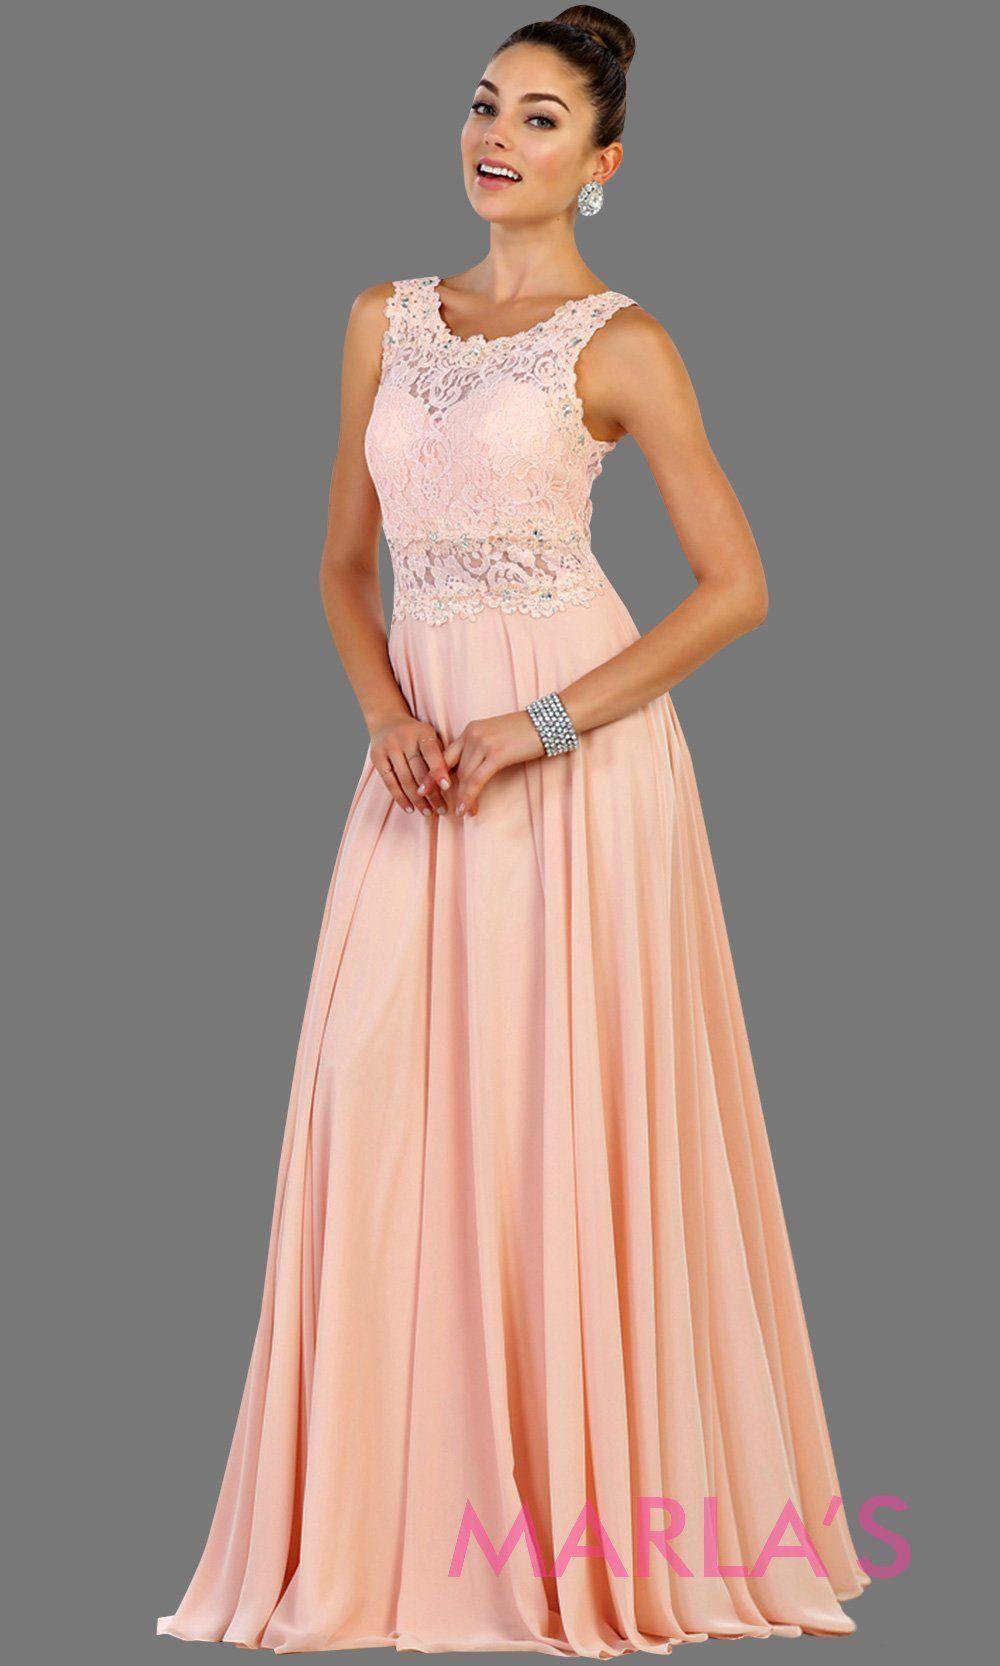 May Queen Mq1539 High Neck Flowy Dress Lace Bodice Dresses Flowy Dress Formal Dresses [ 1666 x 1000 Pixel ]